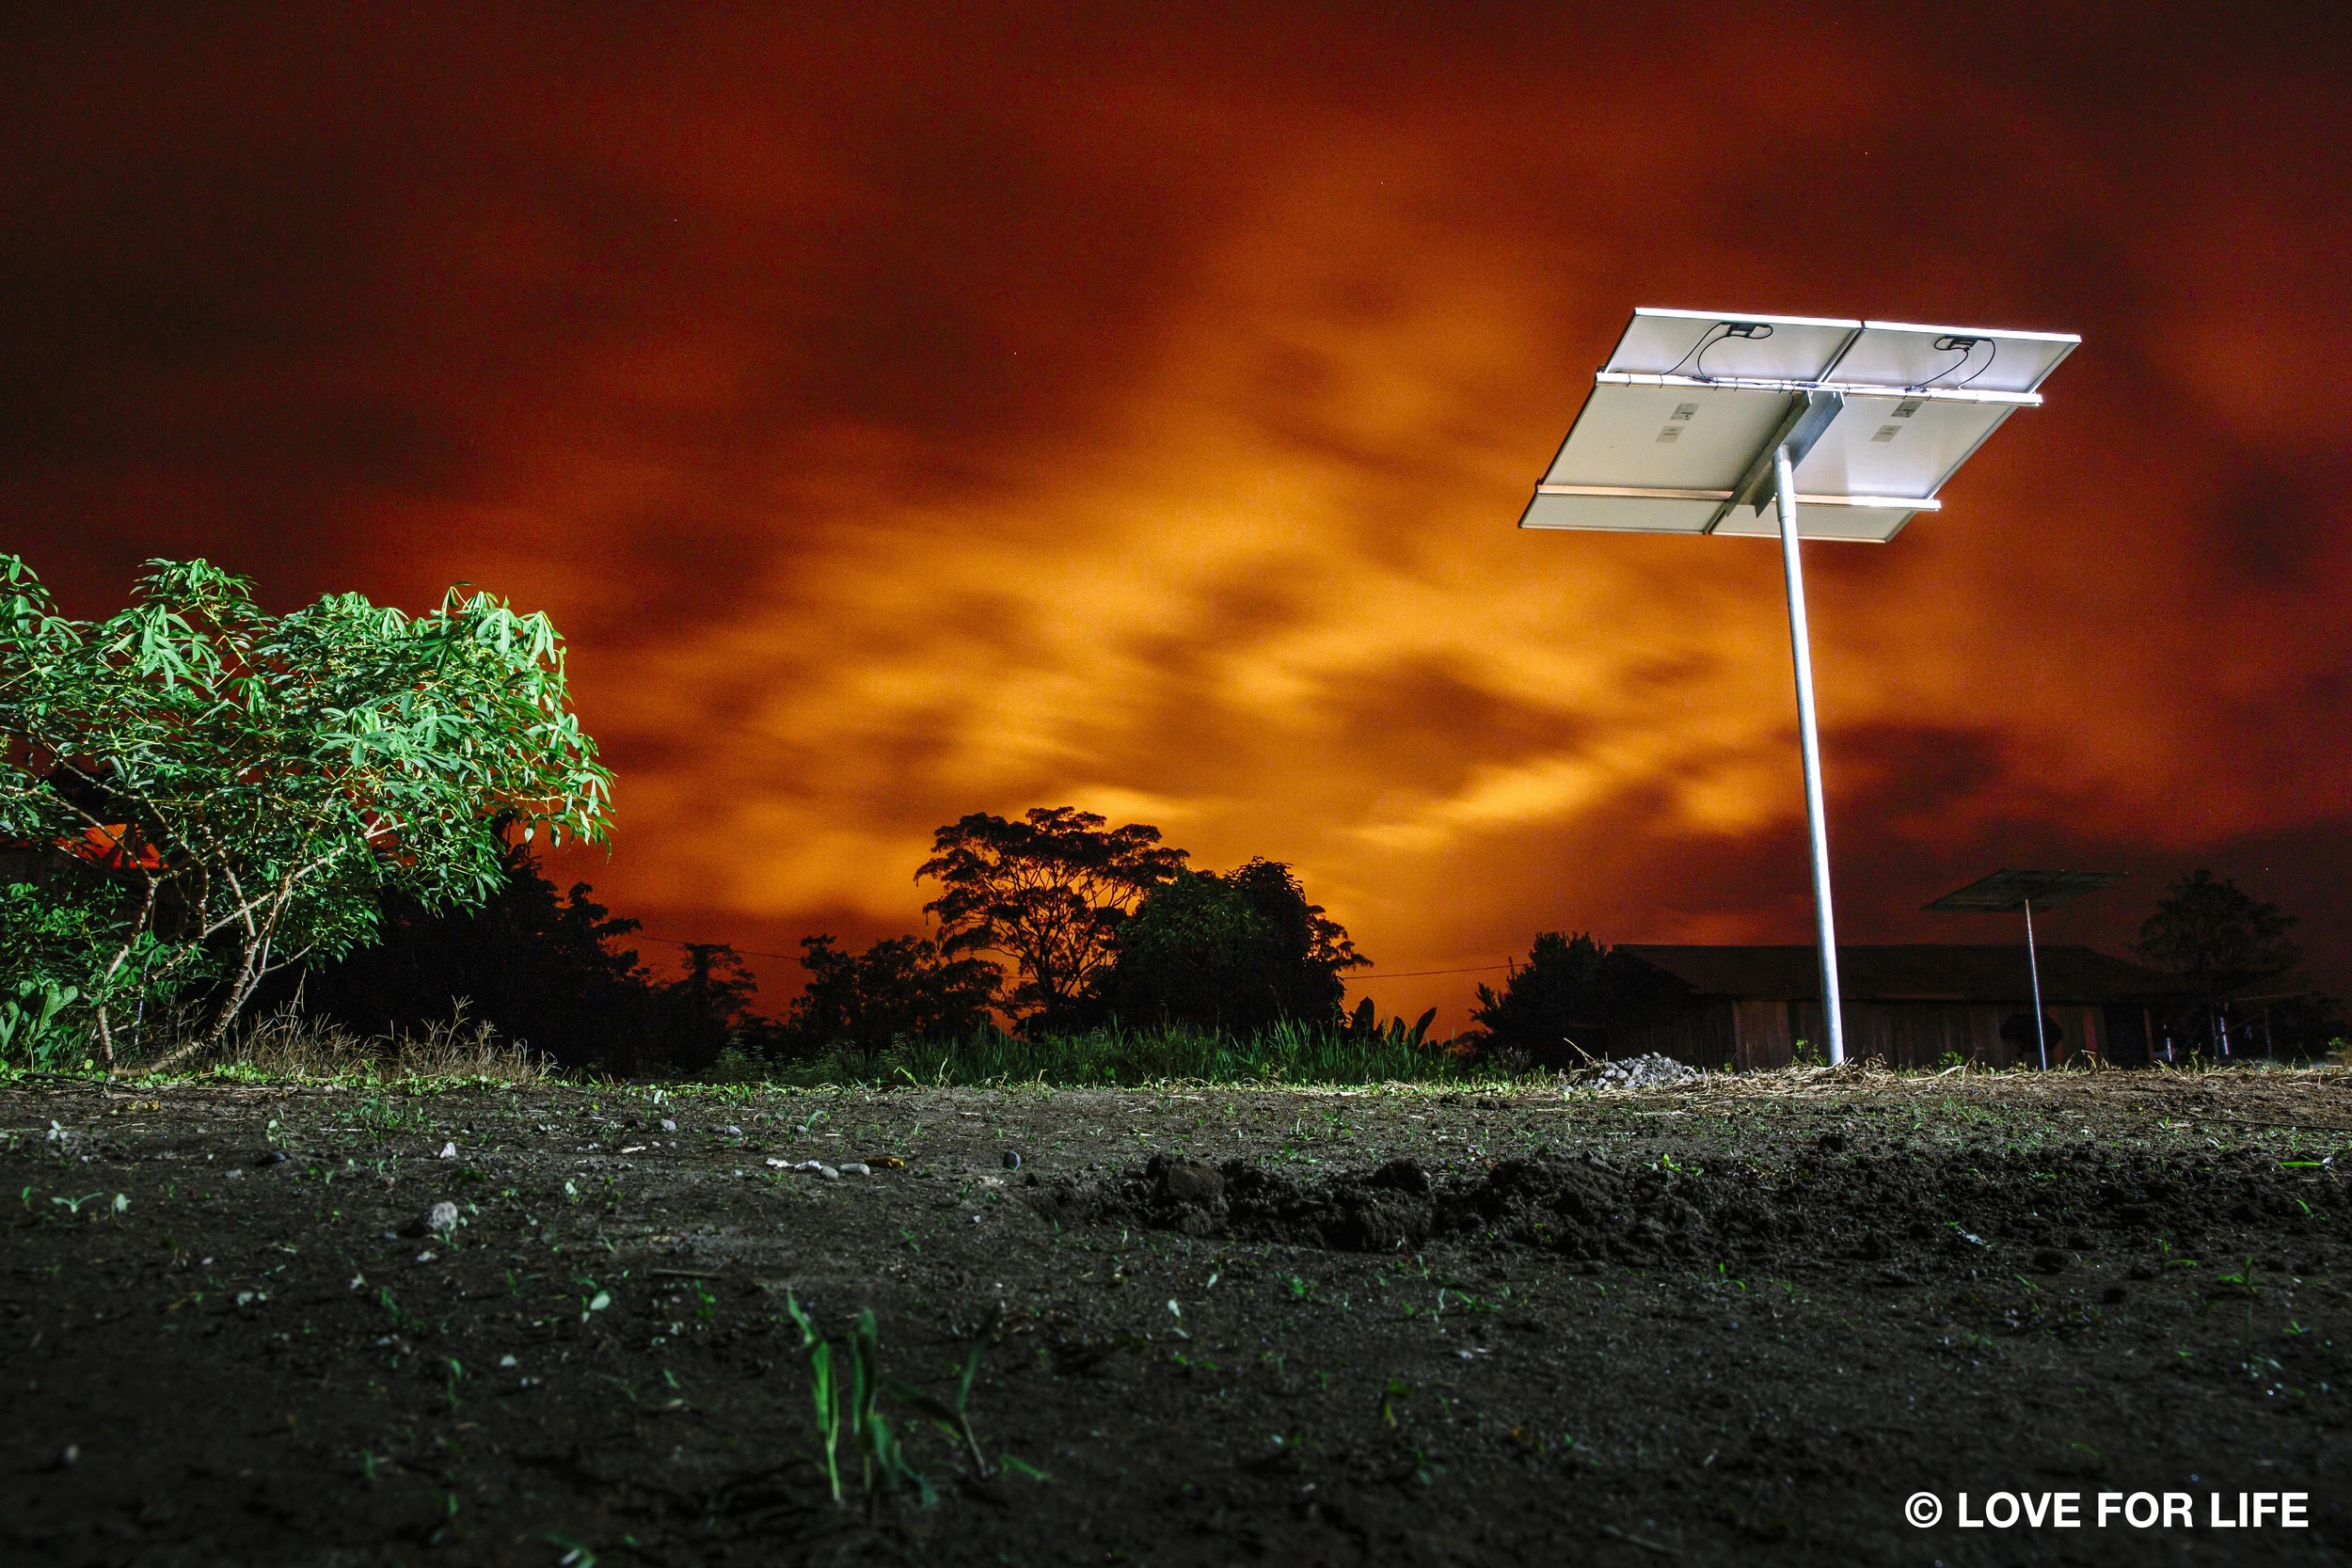 Arausol-Montagesystem einer Insel-Solaranlage im Amazonasgebiet von Ecuador. Der brennende Himmel zeigt die kilometerweit entfernte Abfackelung der Ölförderung.      Normal   0       21       false   false   false     DE   X-NONE   X-NONE                                                                                                                                                                                                                                                                                                                                                                                                                                                                                                                                                                                                                                                                                                                                                                                                                                                               Normal   0       21       false   false   false     DE   X-NONE   X-NONE                                                                                                                                                                                                                                                                                                                                                                                                                                                                                                                                                                                                                                                                                                                                                                                                                                                            /* Style Definitions */  table.